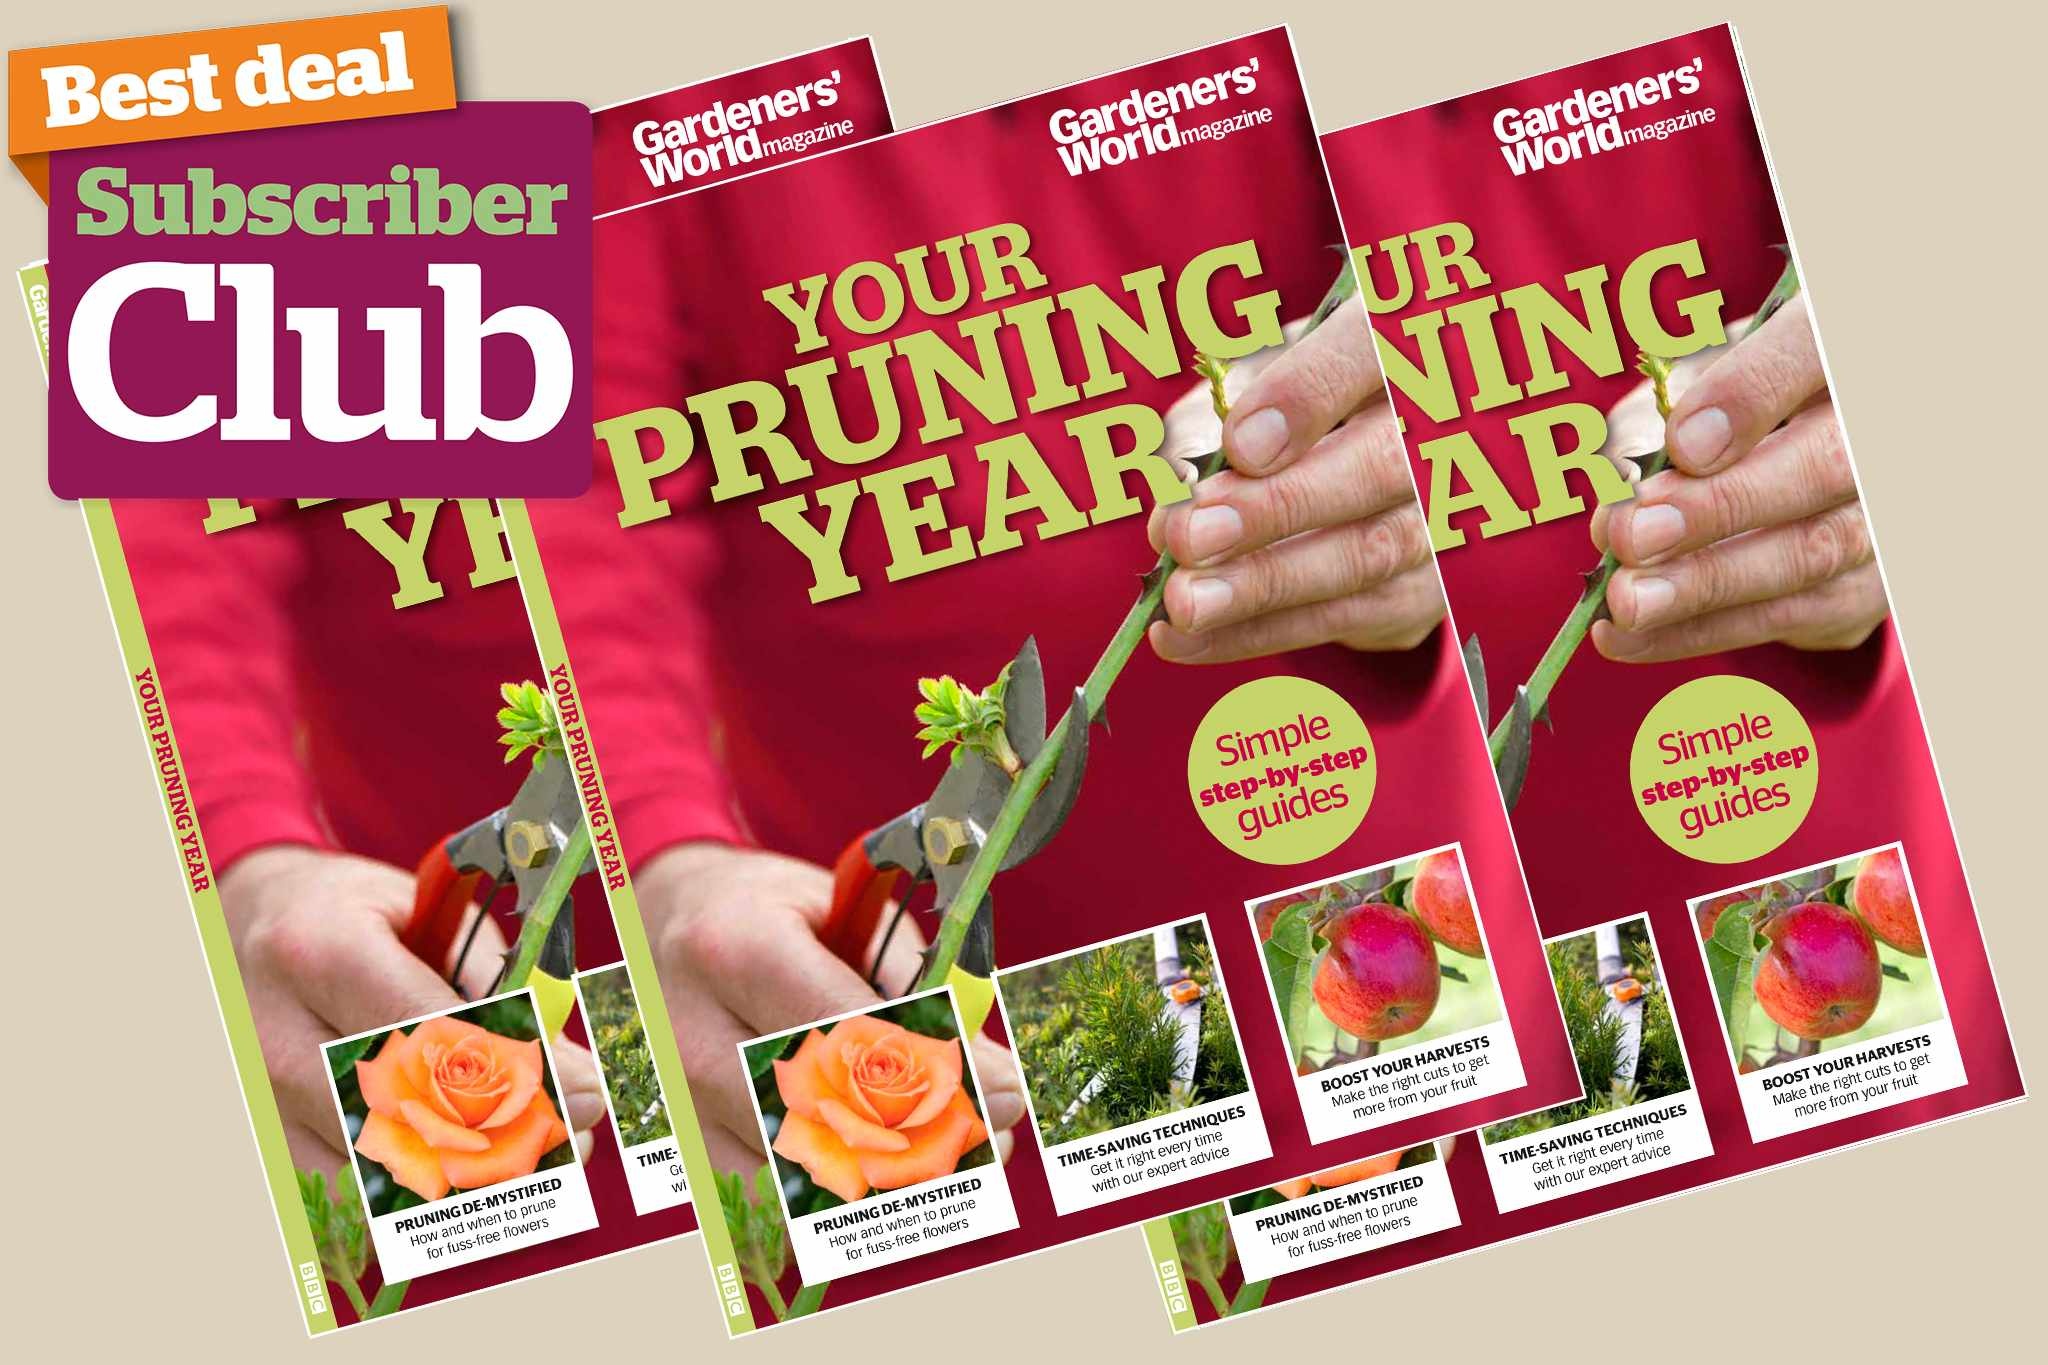 Your Pruning Year bookazine